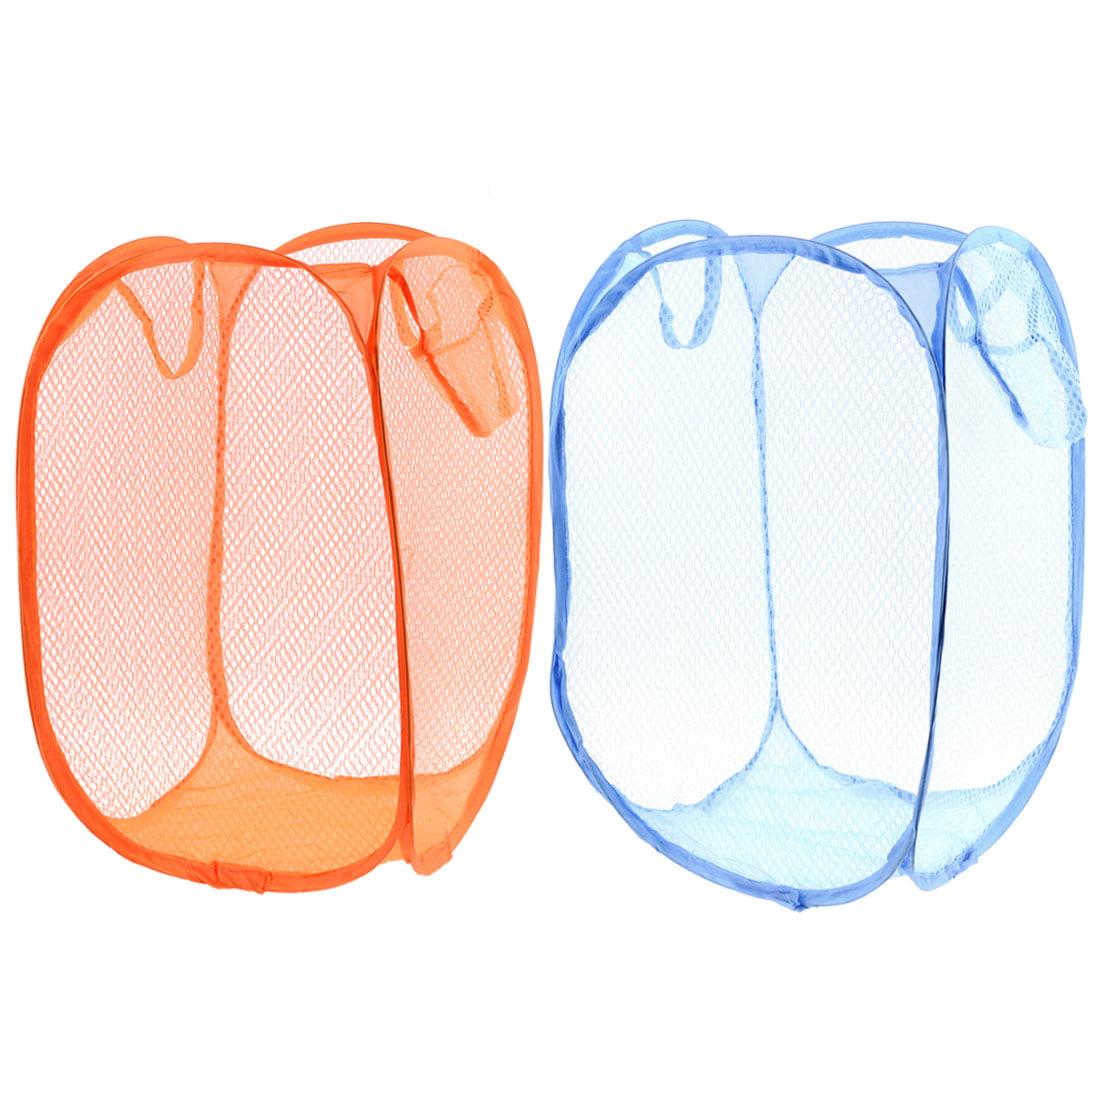 2pcs Orange Blue Foldable Meshy Clothes Storage Pop Up Laundry Basket Hamper